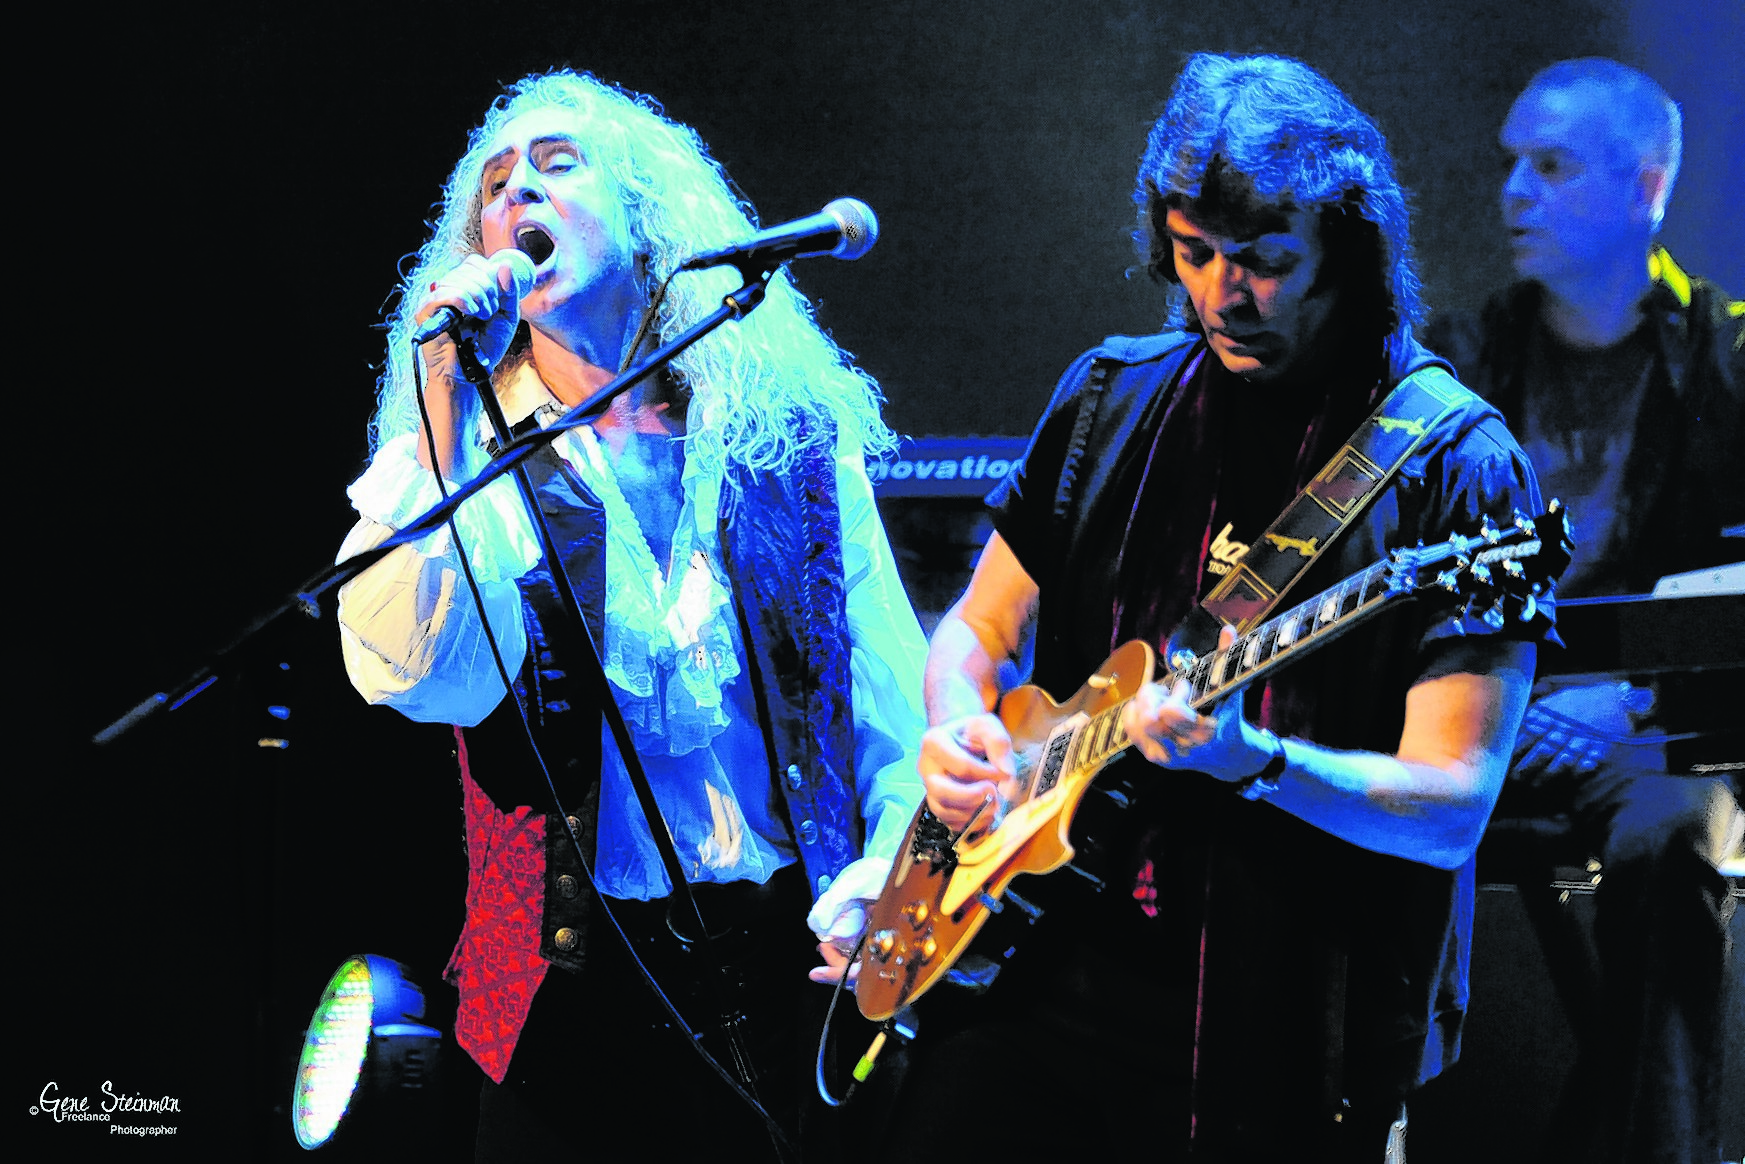 Steve Hackett, right, performing with Nad Sylvan. Photo: Gene Steinman